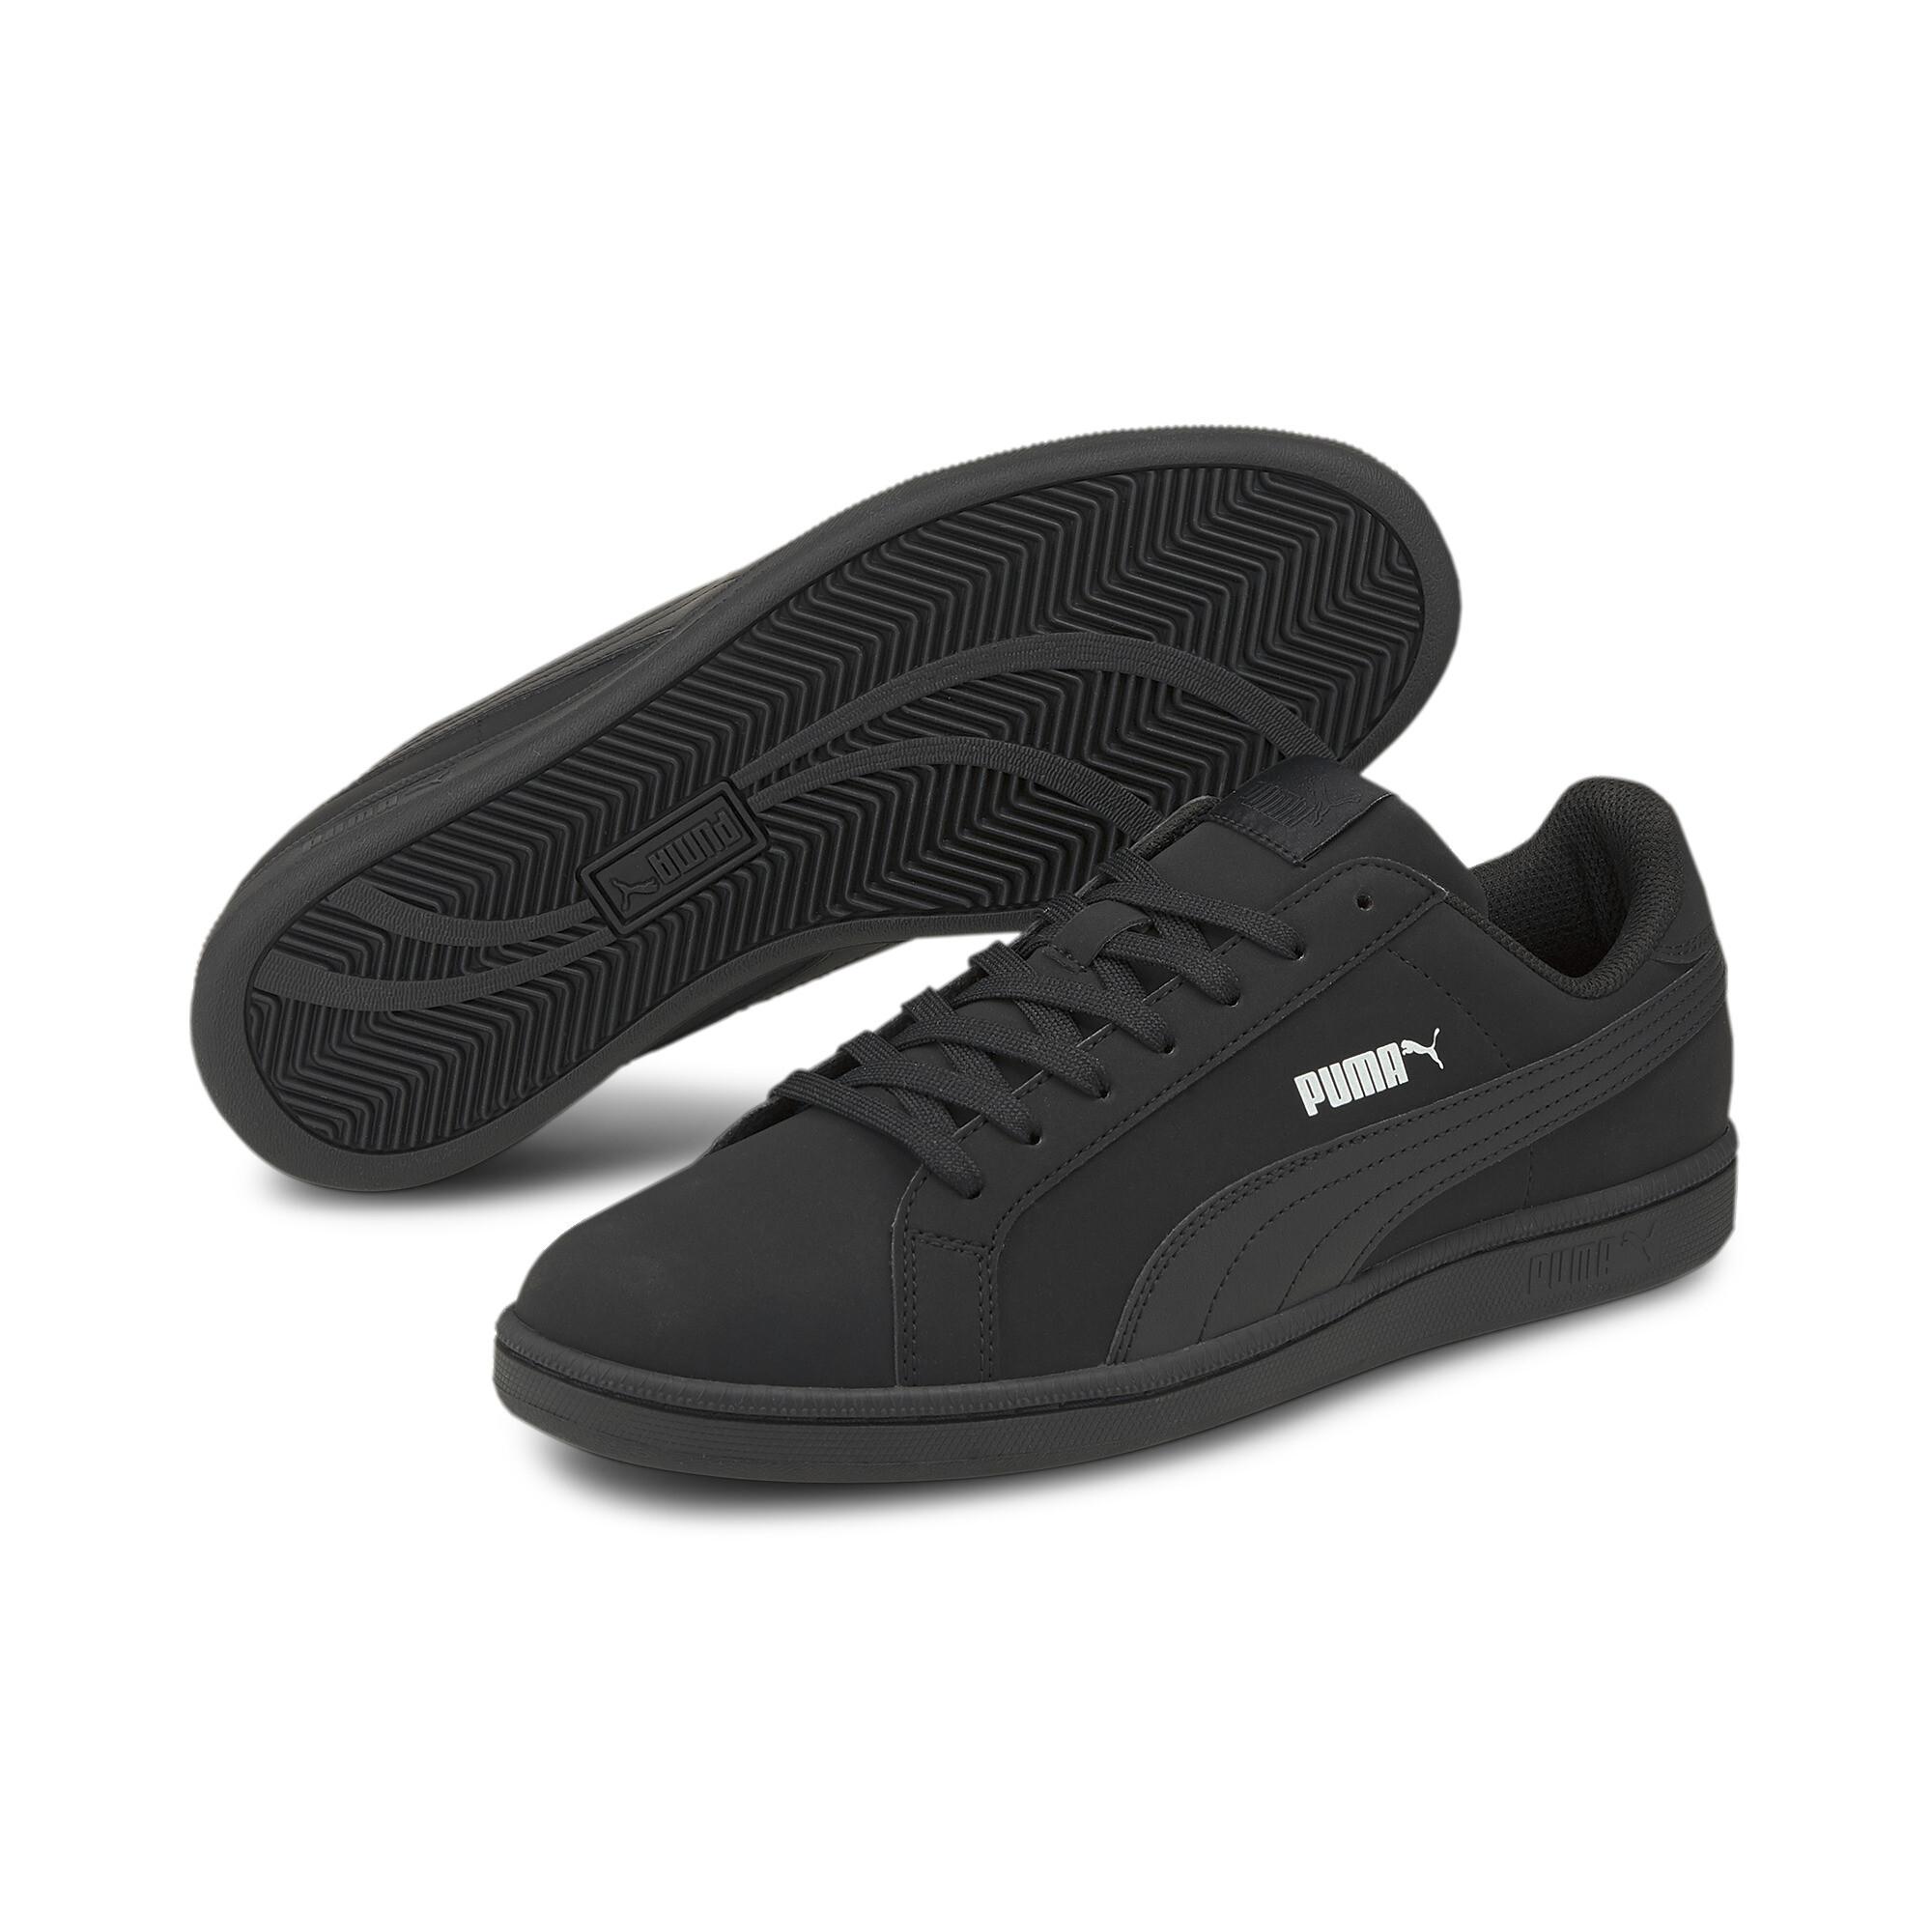 Indexbild 18 - PUMA Smash Buck Sneaker Unisex Schuhe Sport Classics Neu